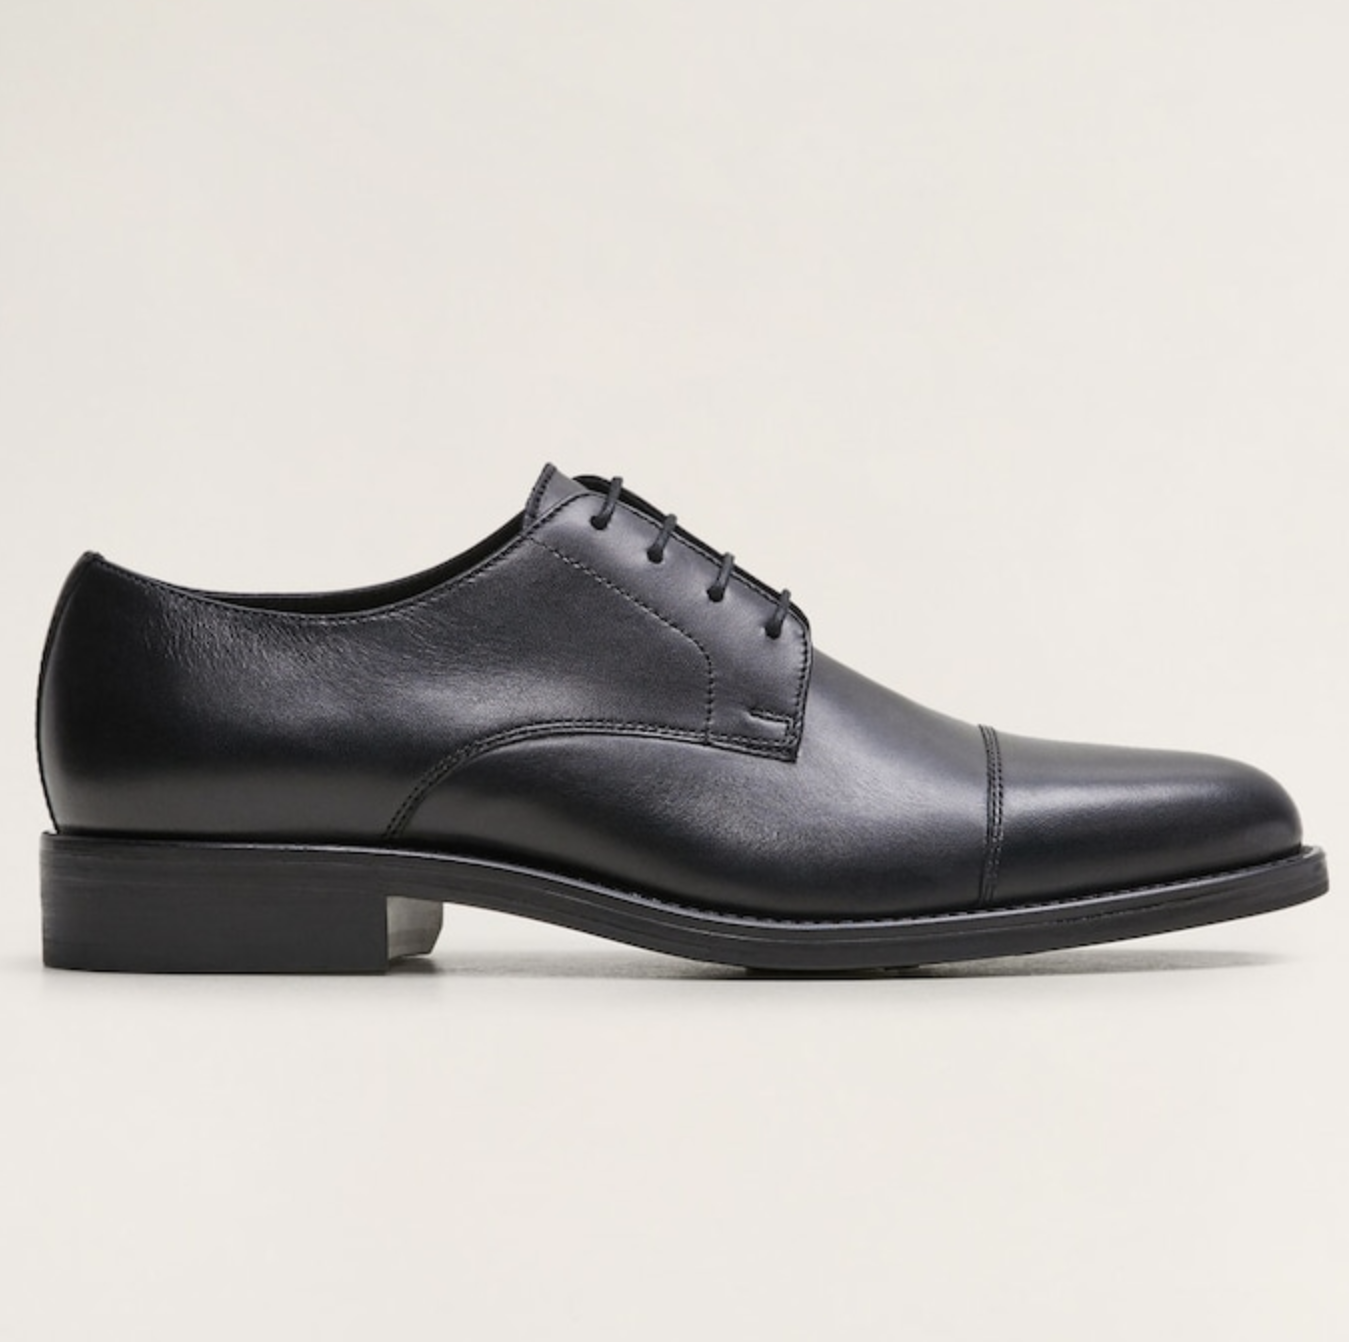 Zapatos hombre negro Mango, zapatos traje hombre